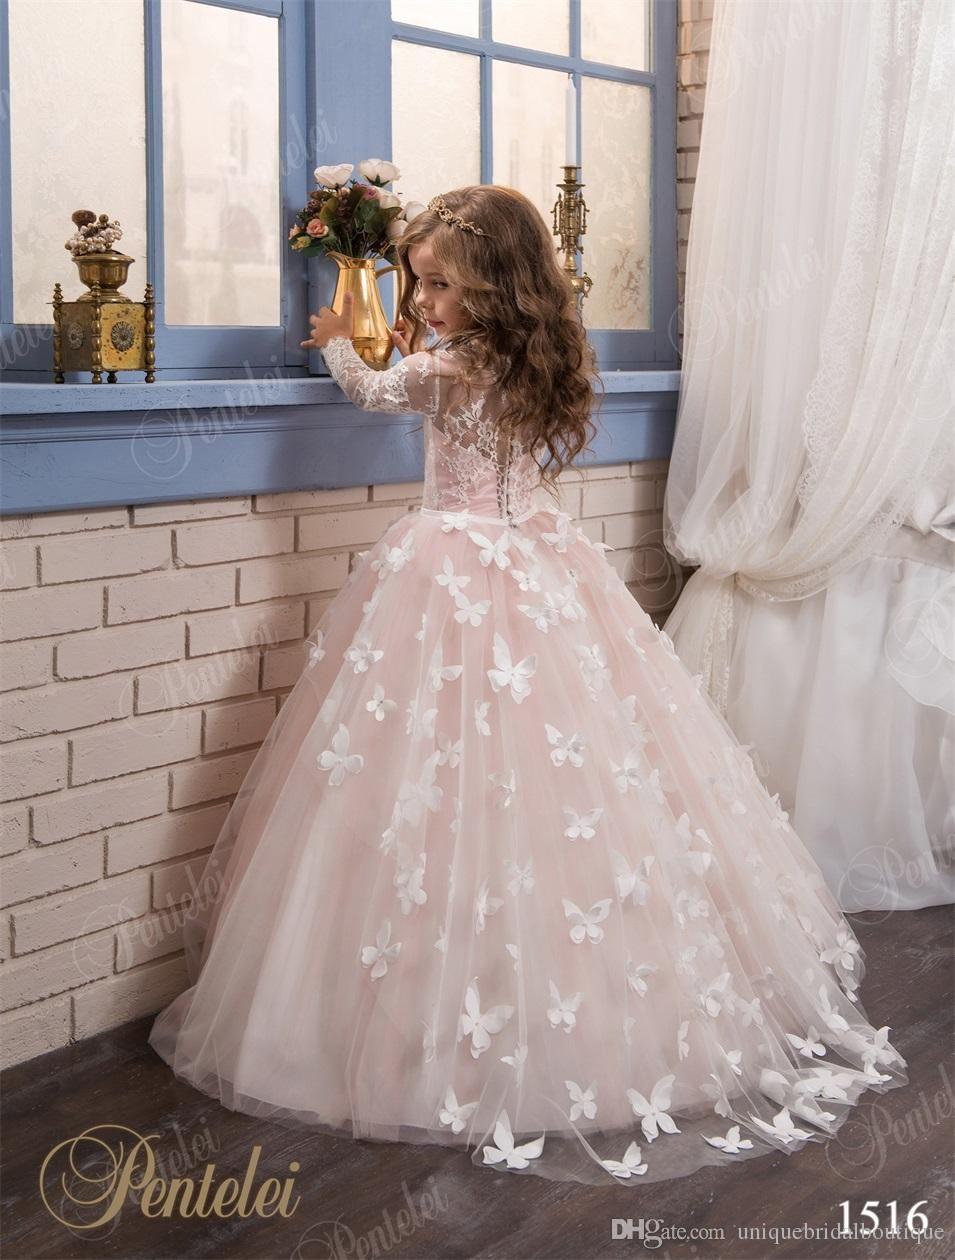 Butterfly Flower Girls Dresses 2017 Pentelei with Long